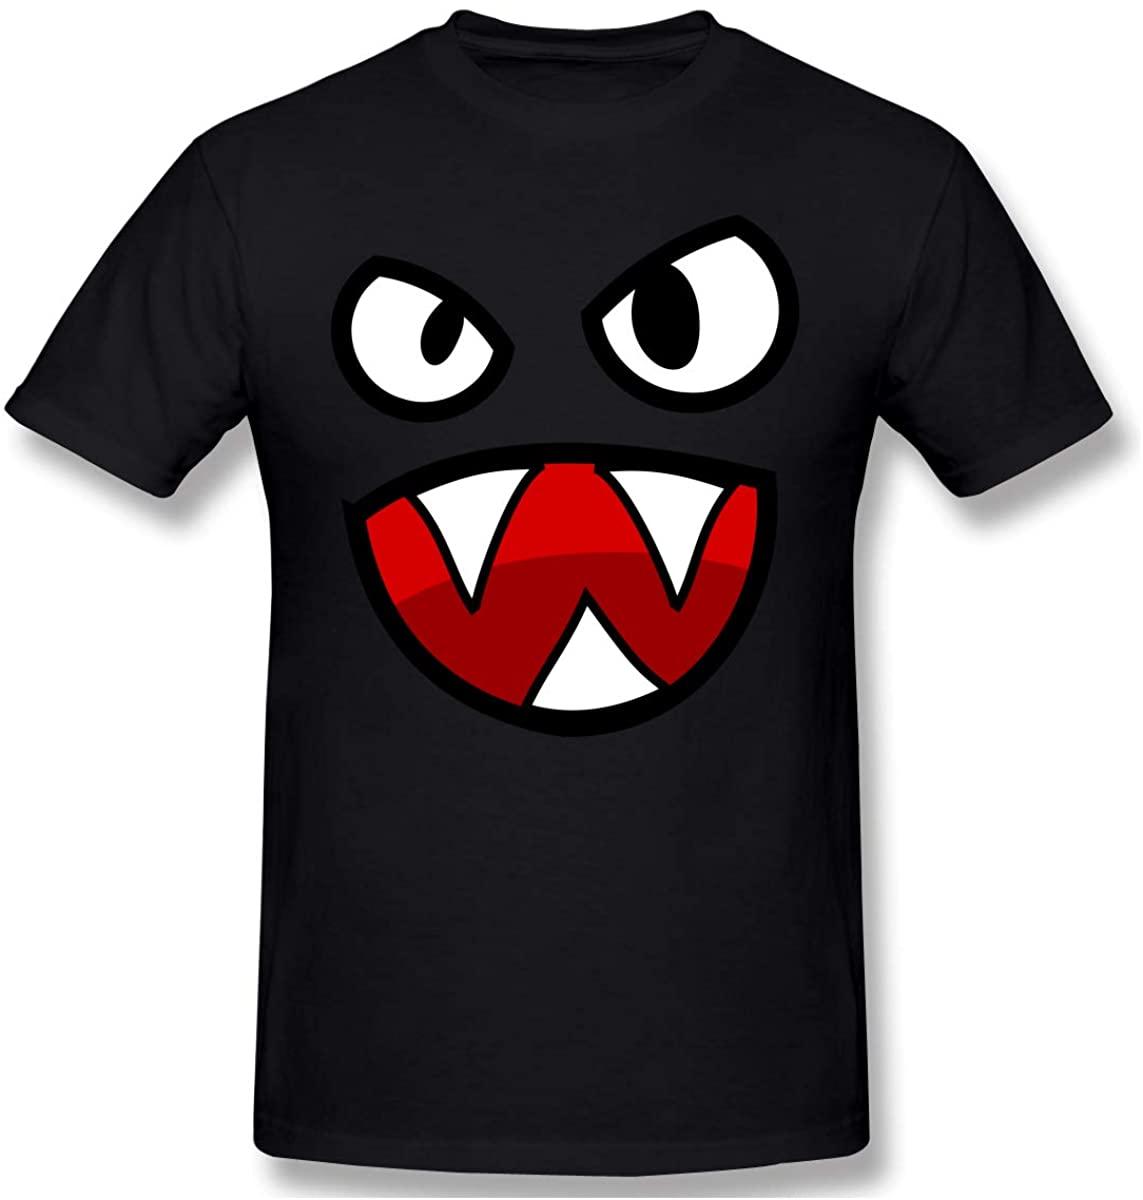 Padida Mens Cartoon-Monster Black Graphic Customlized Tees O-Neck Short Sleeve T-Shirt